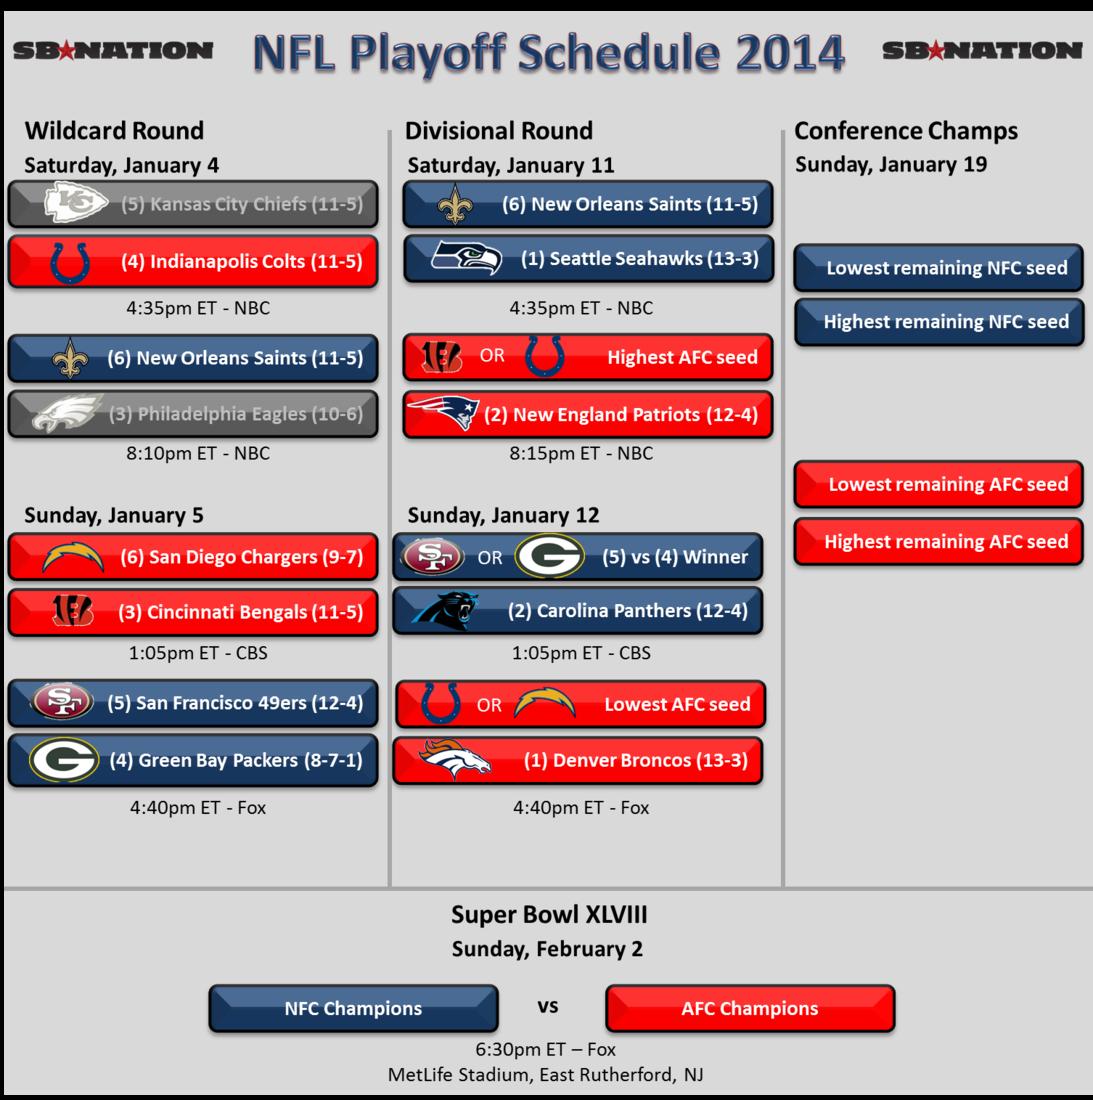 Nfl Playoff Schedule 2014 Saints Upset Eagles Will